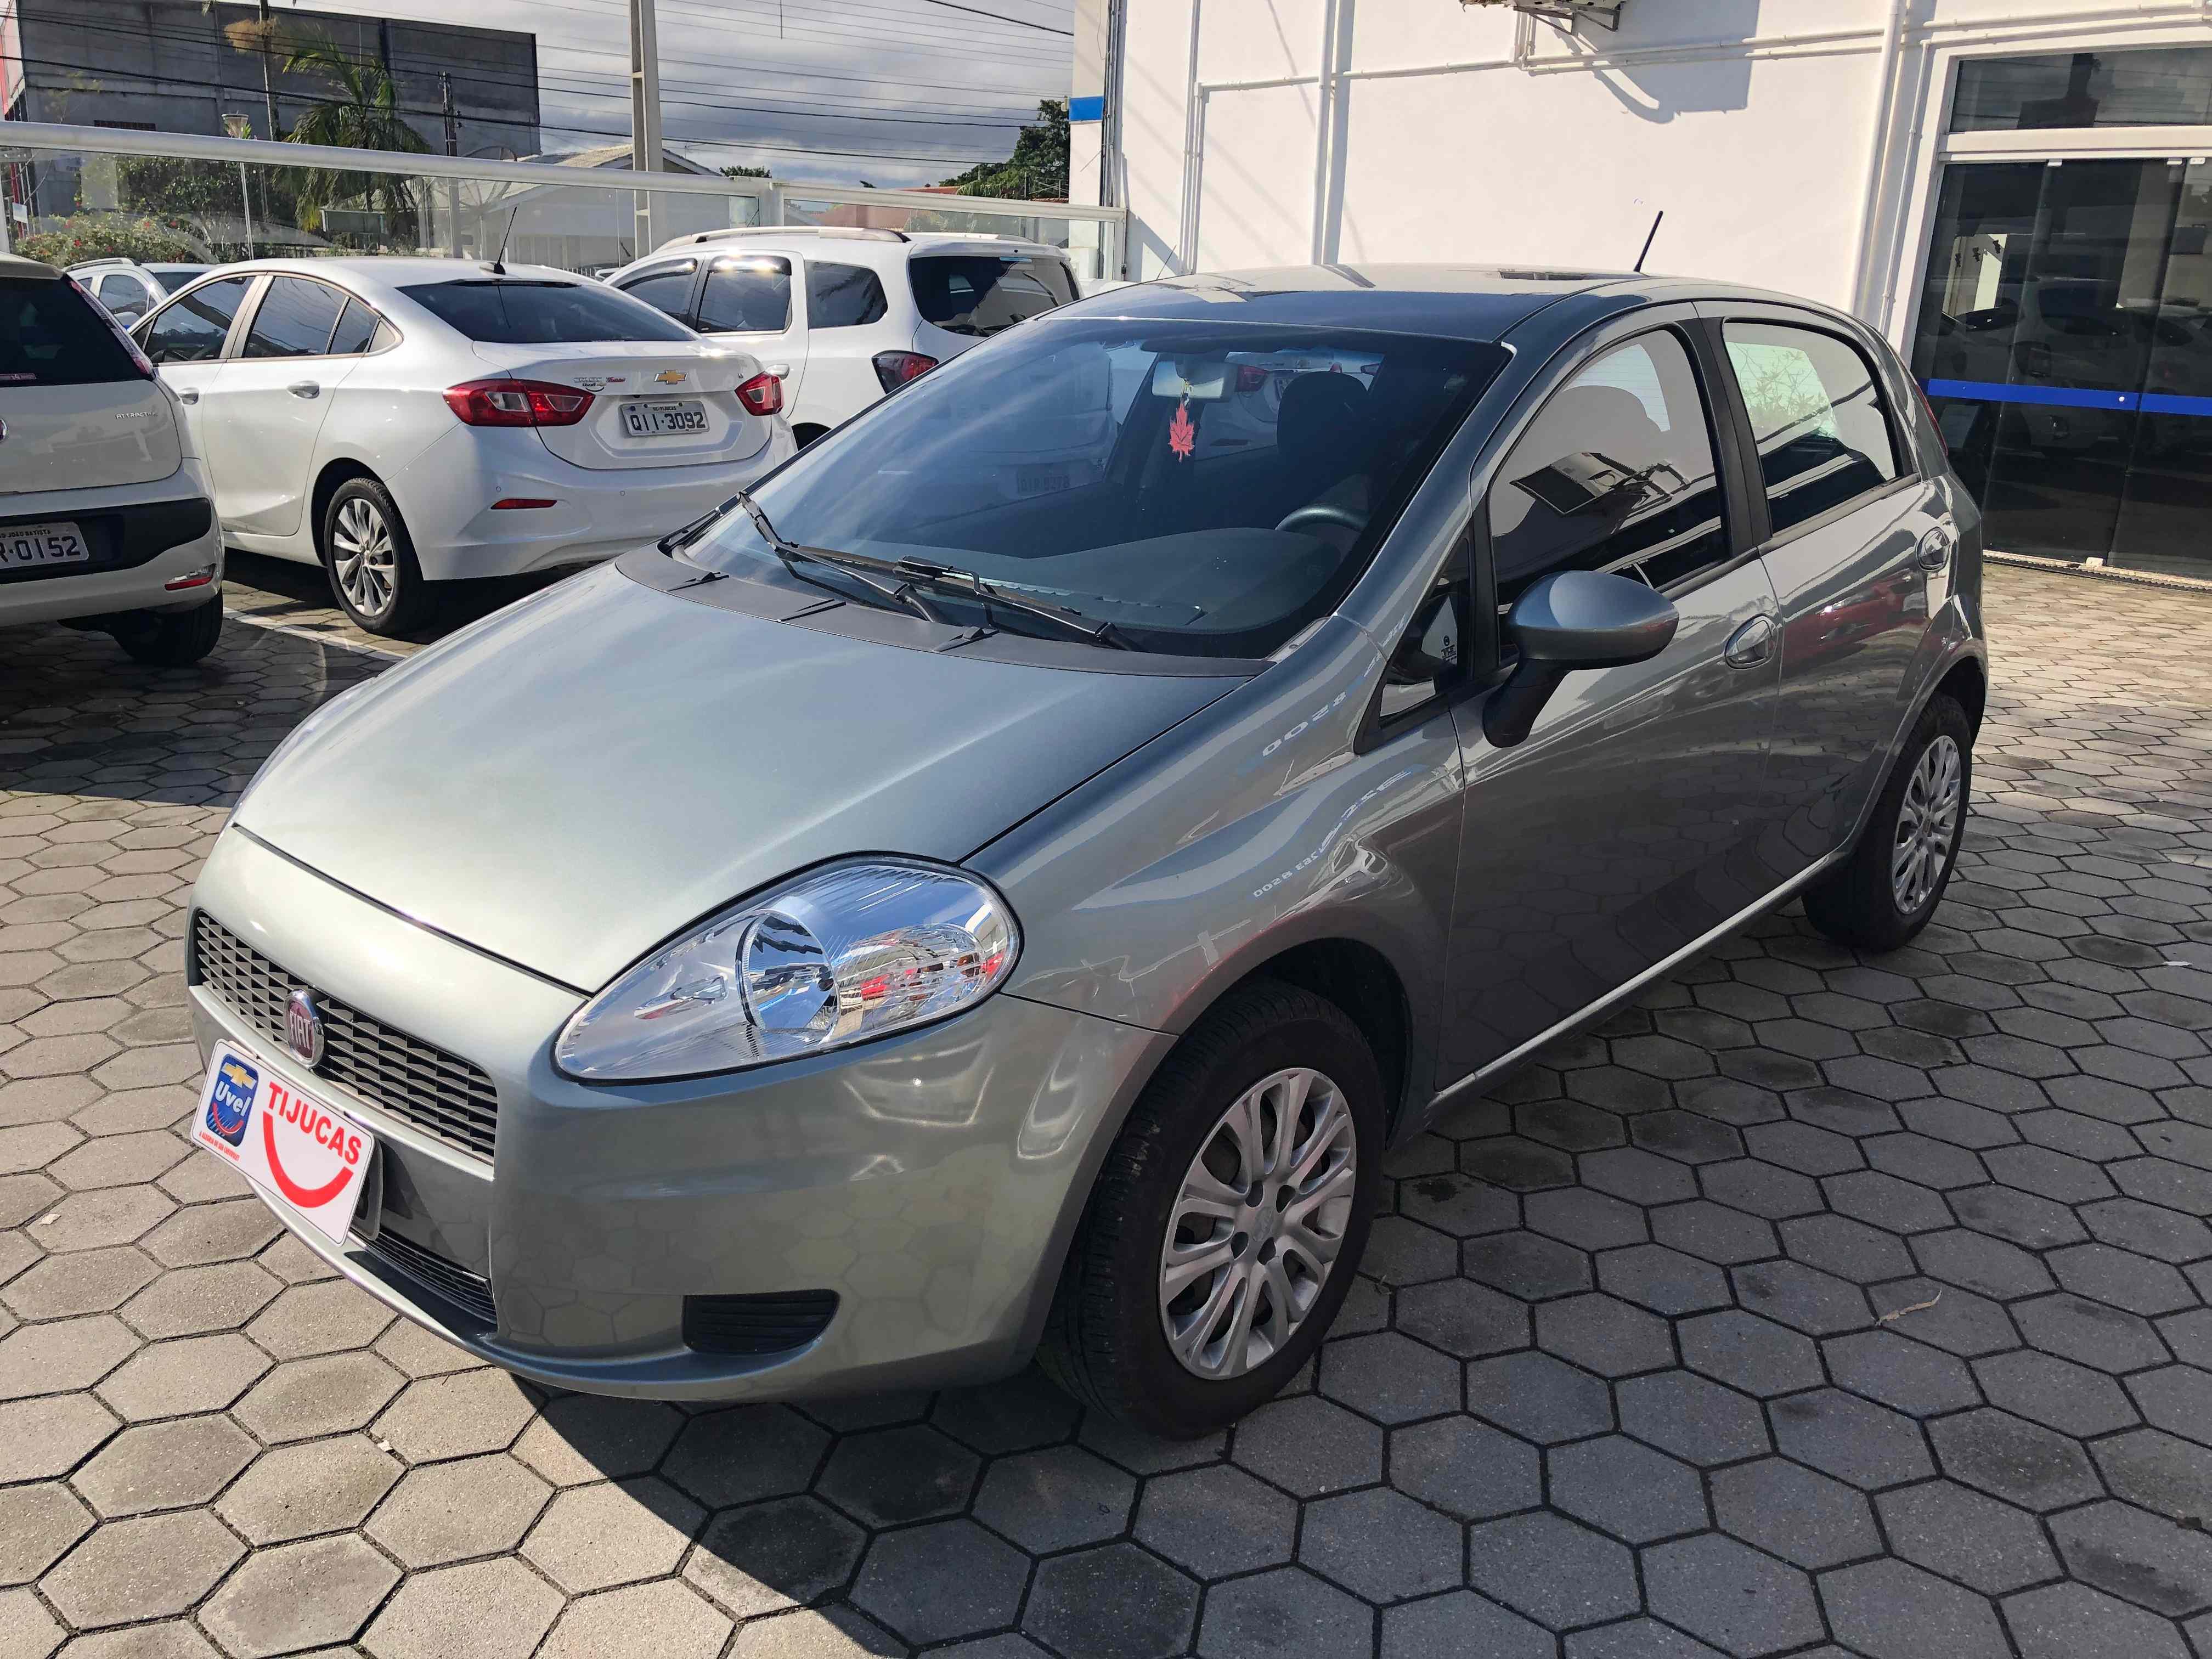 Fiat Punto ATTRACTIV 1.4L 2012